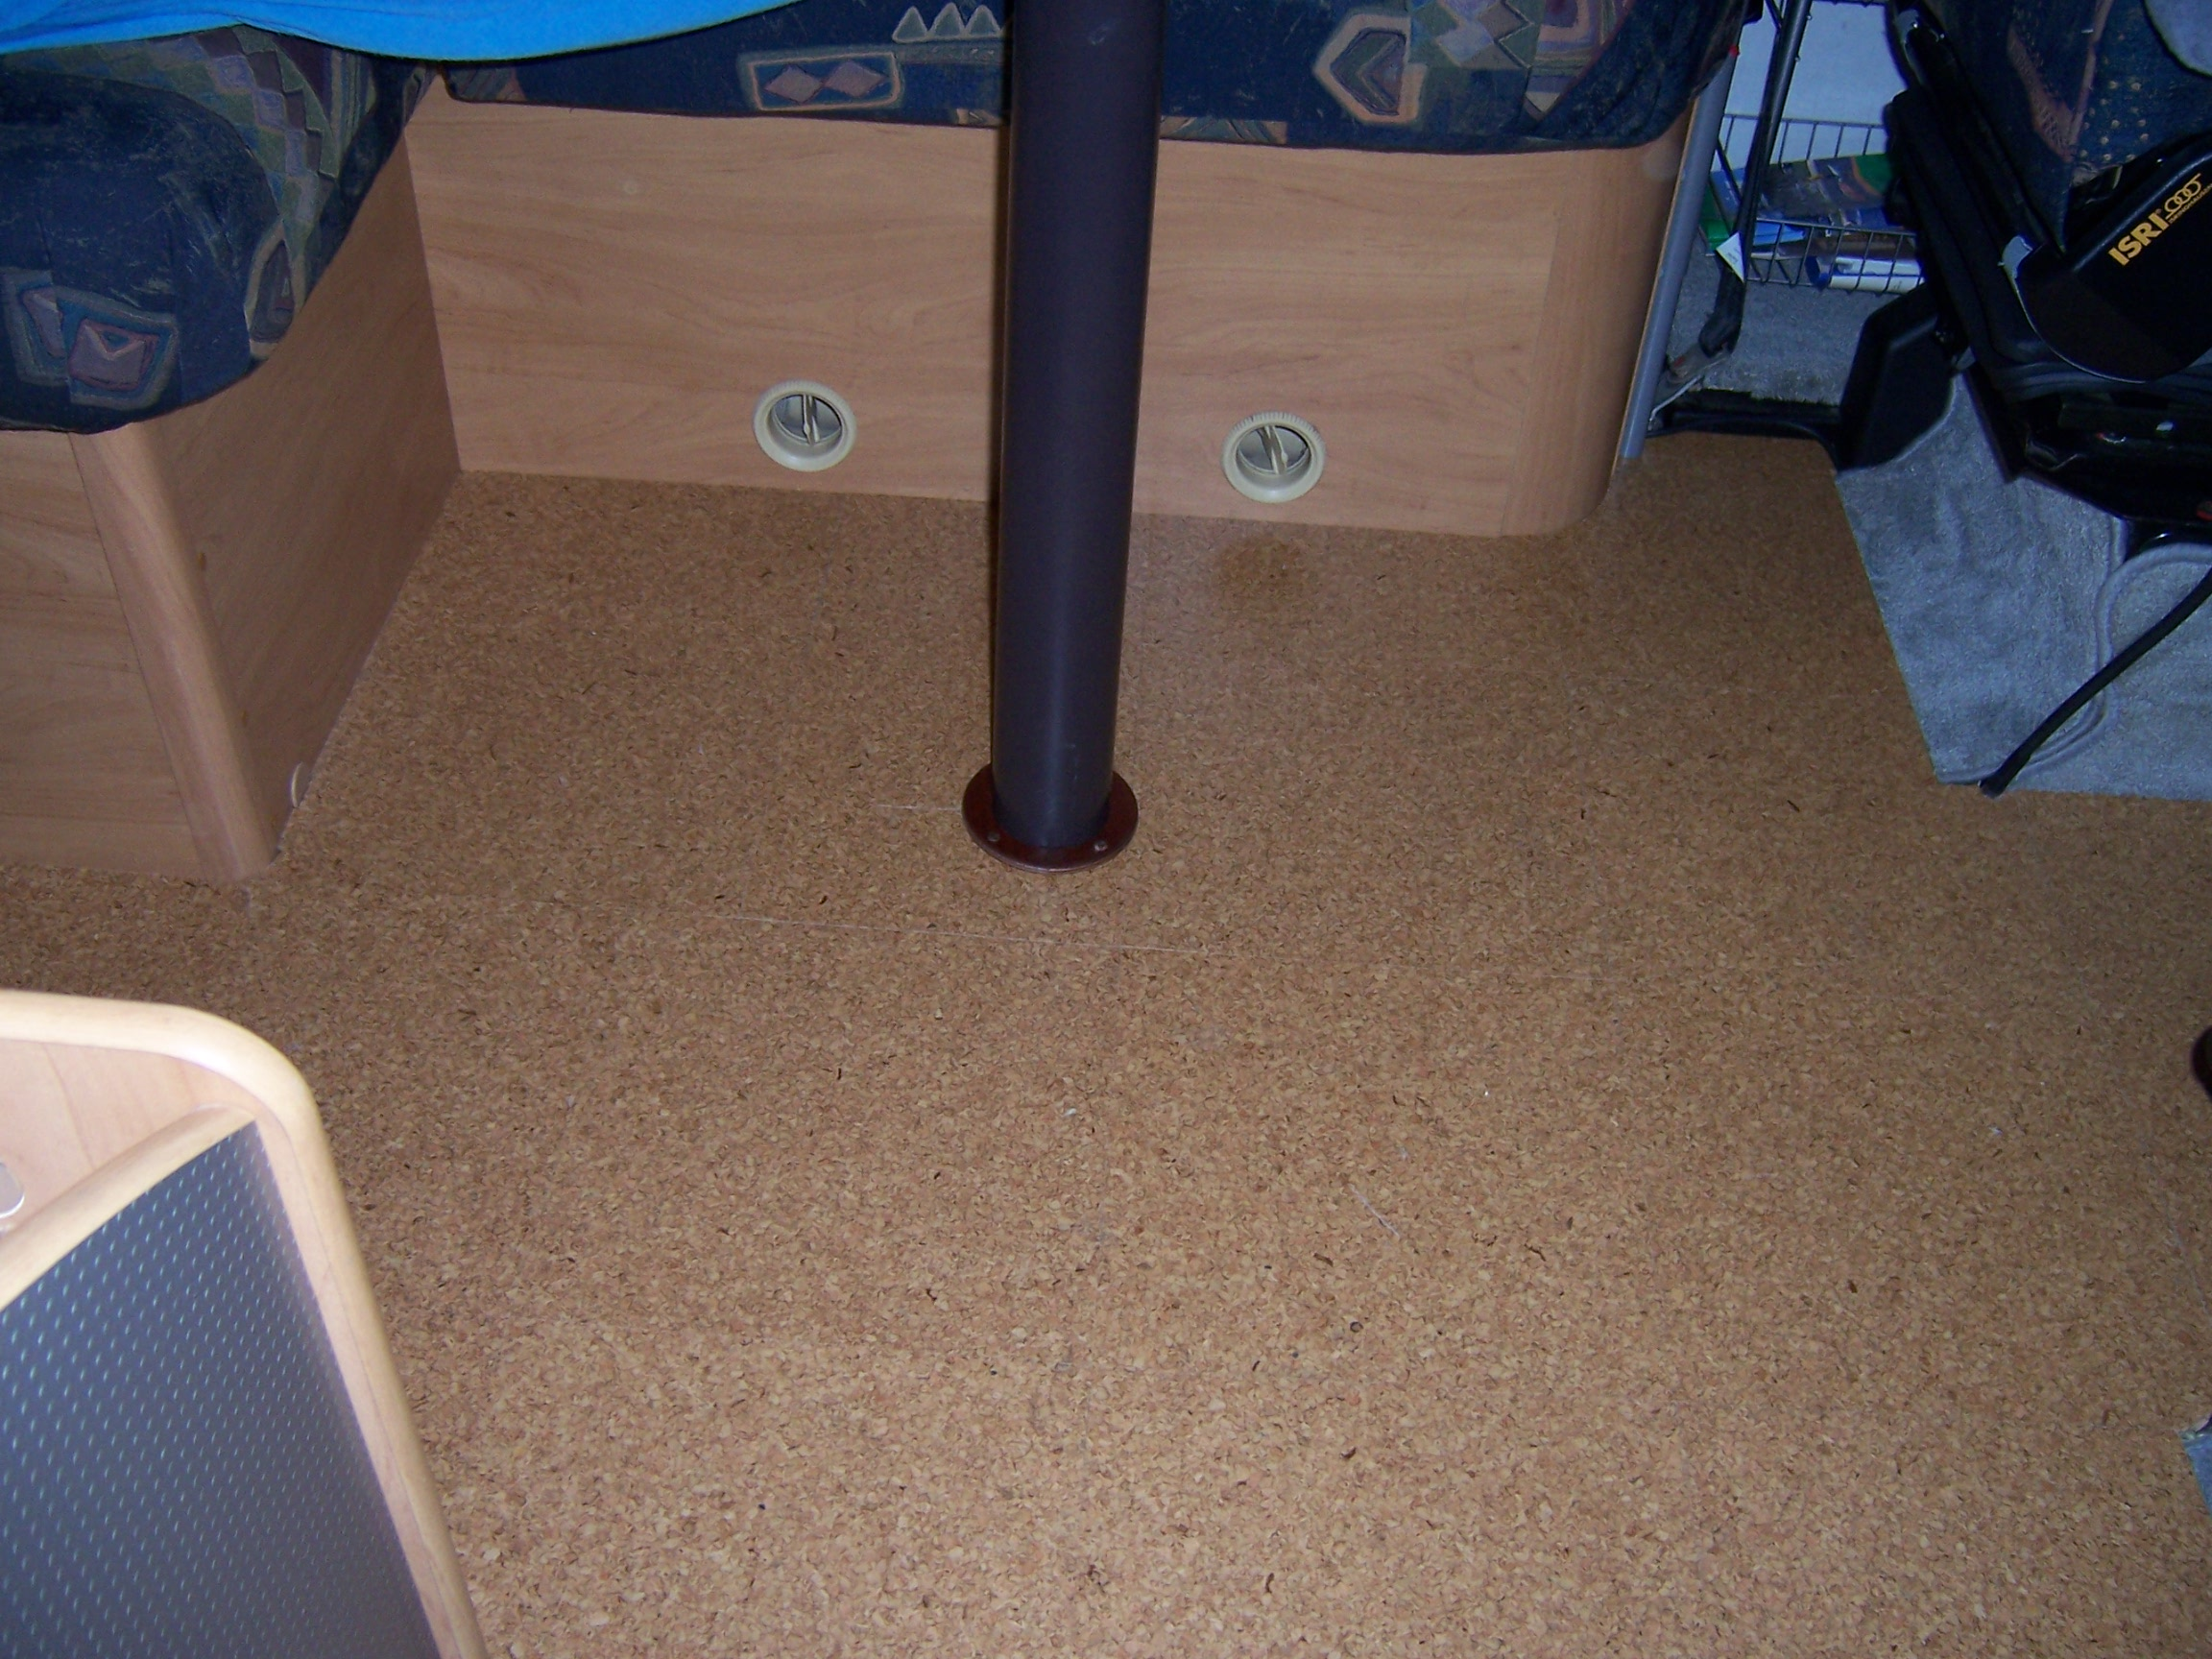 korkfliesen als bodenbelag wohnmobil forum. Black Bedroom Furniture Sets. Home Design Ideas